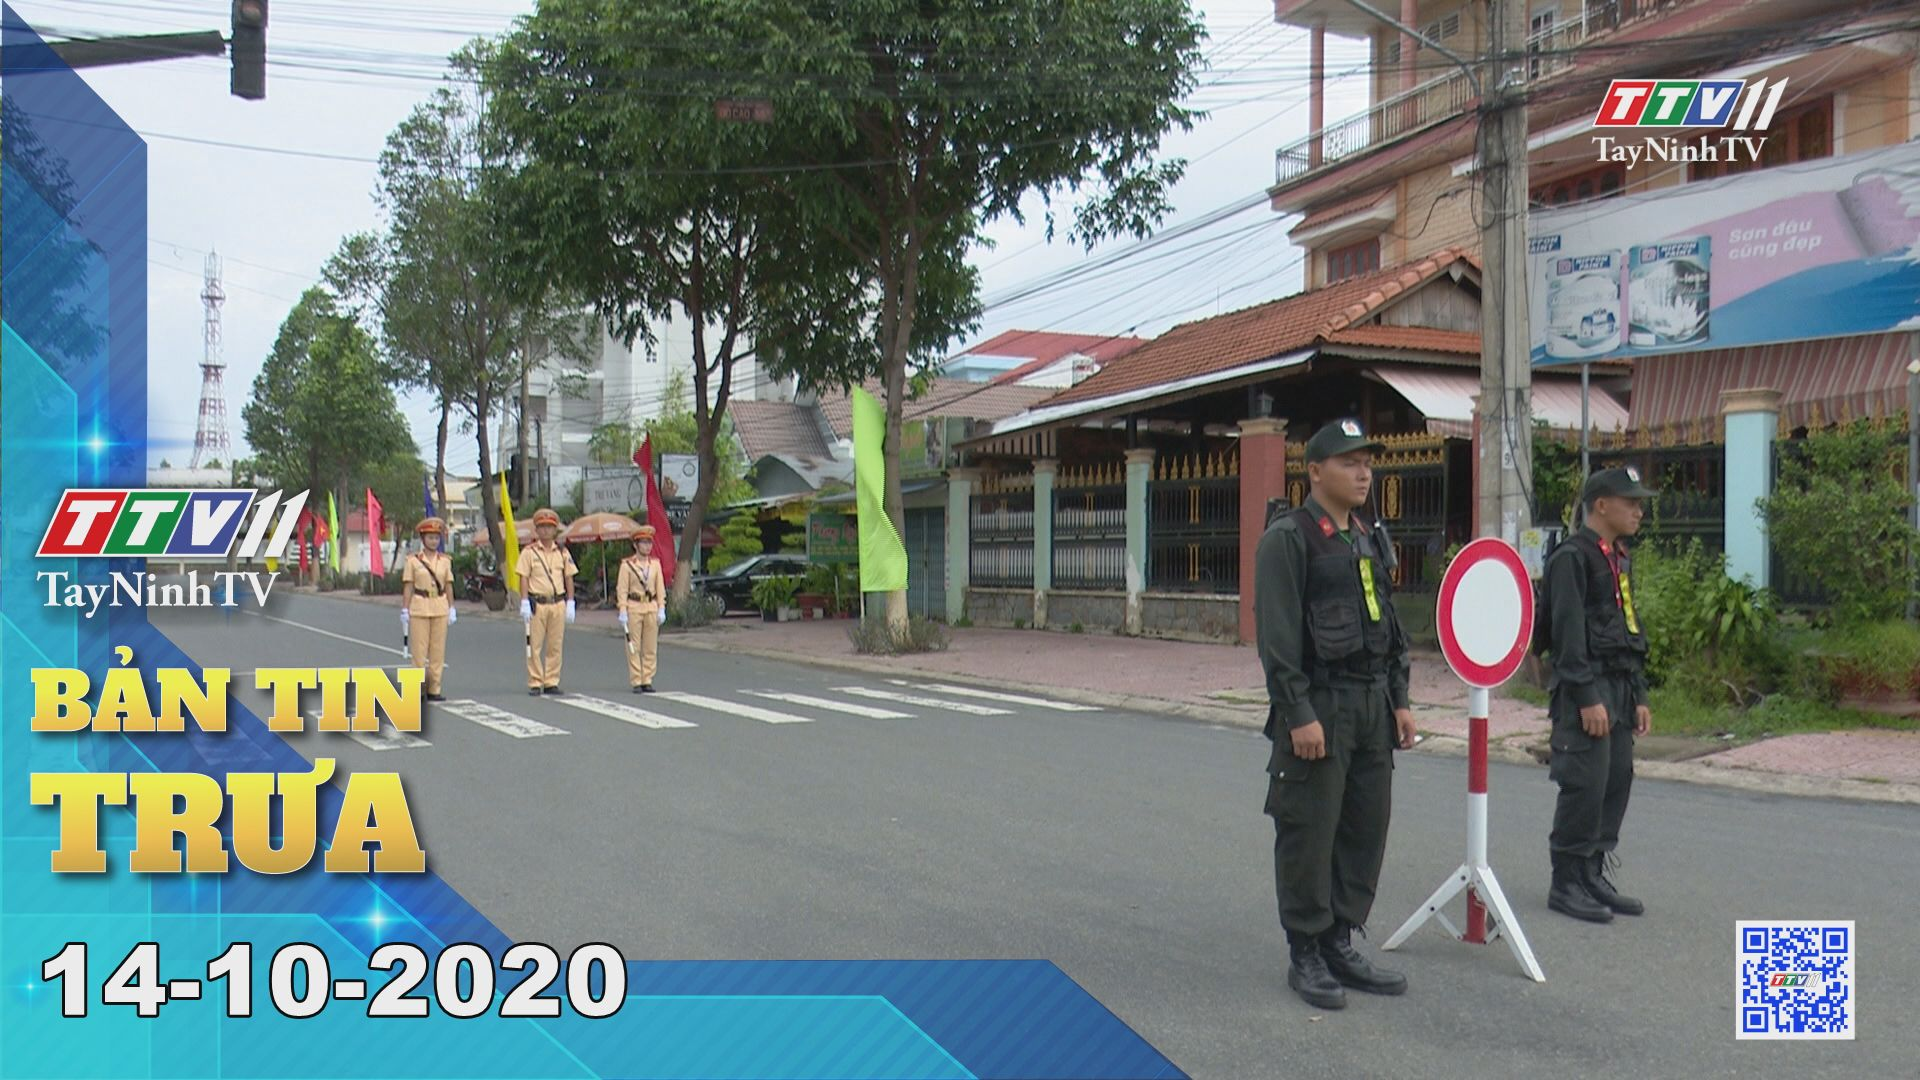 Bản tin trưa 14-10-2020 | Tin tức hôm nay | TayNinhTV